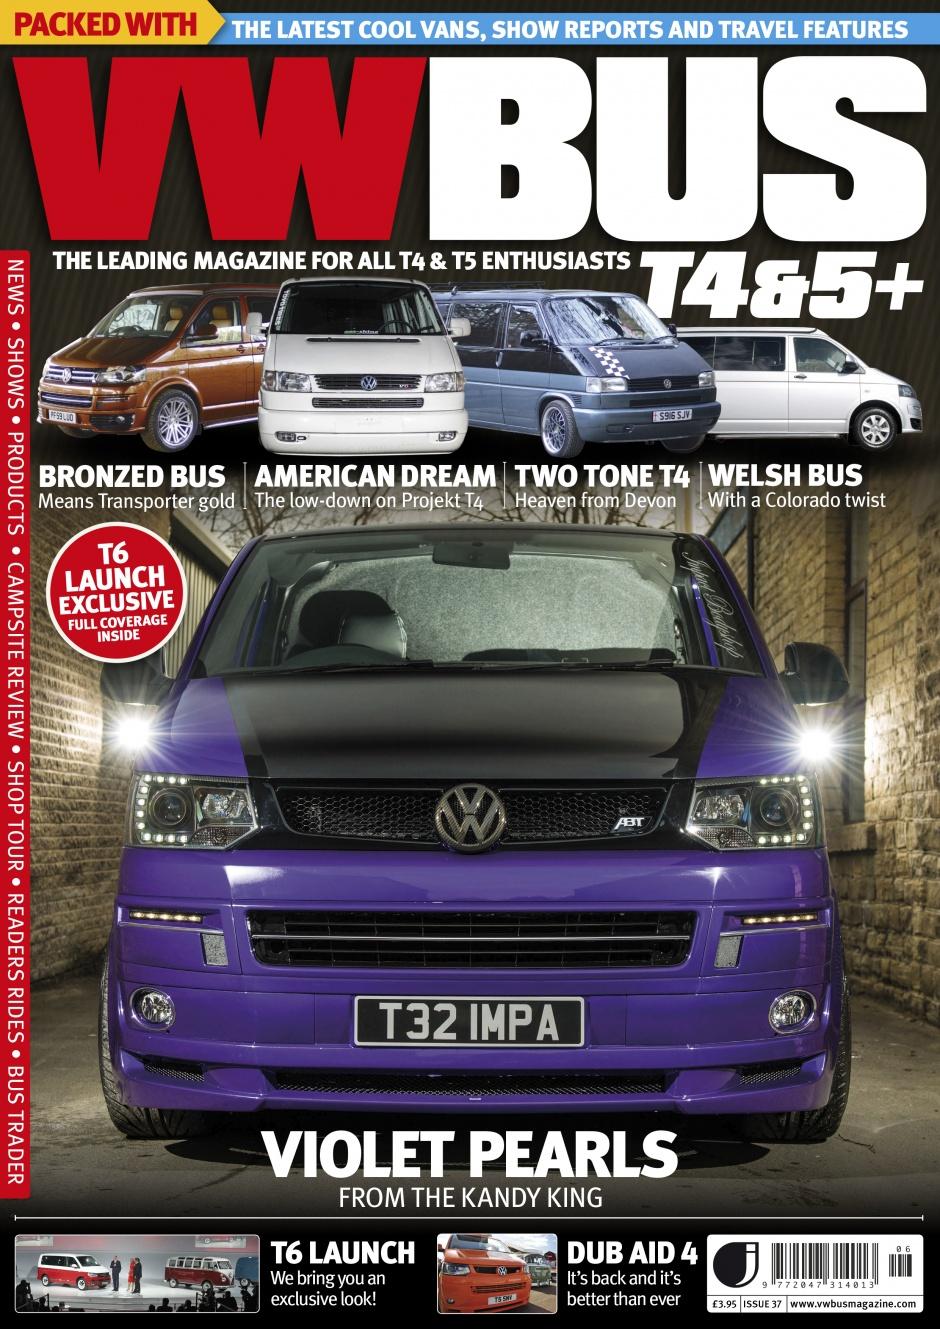 vw bus t4 t5 magazine 37 vwbus t4 t5. Black Bedroom Furniture Sets. Home Design Ideas